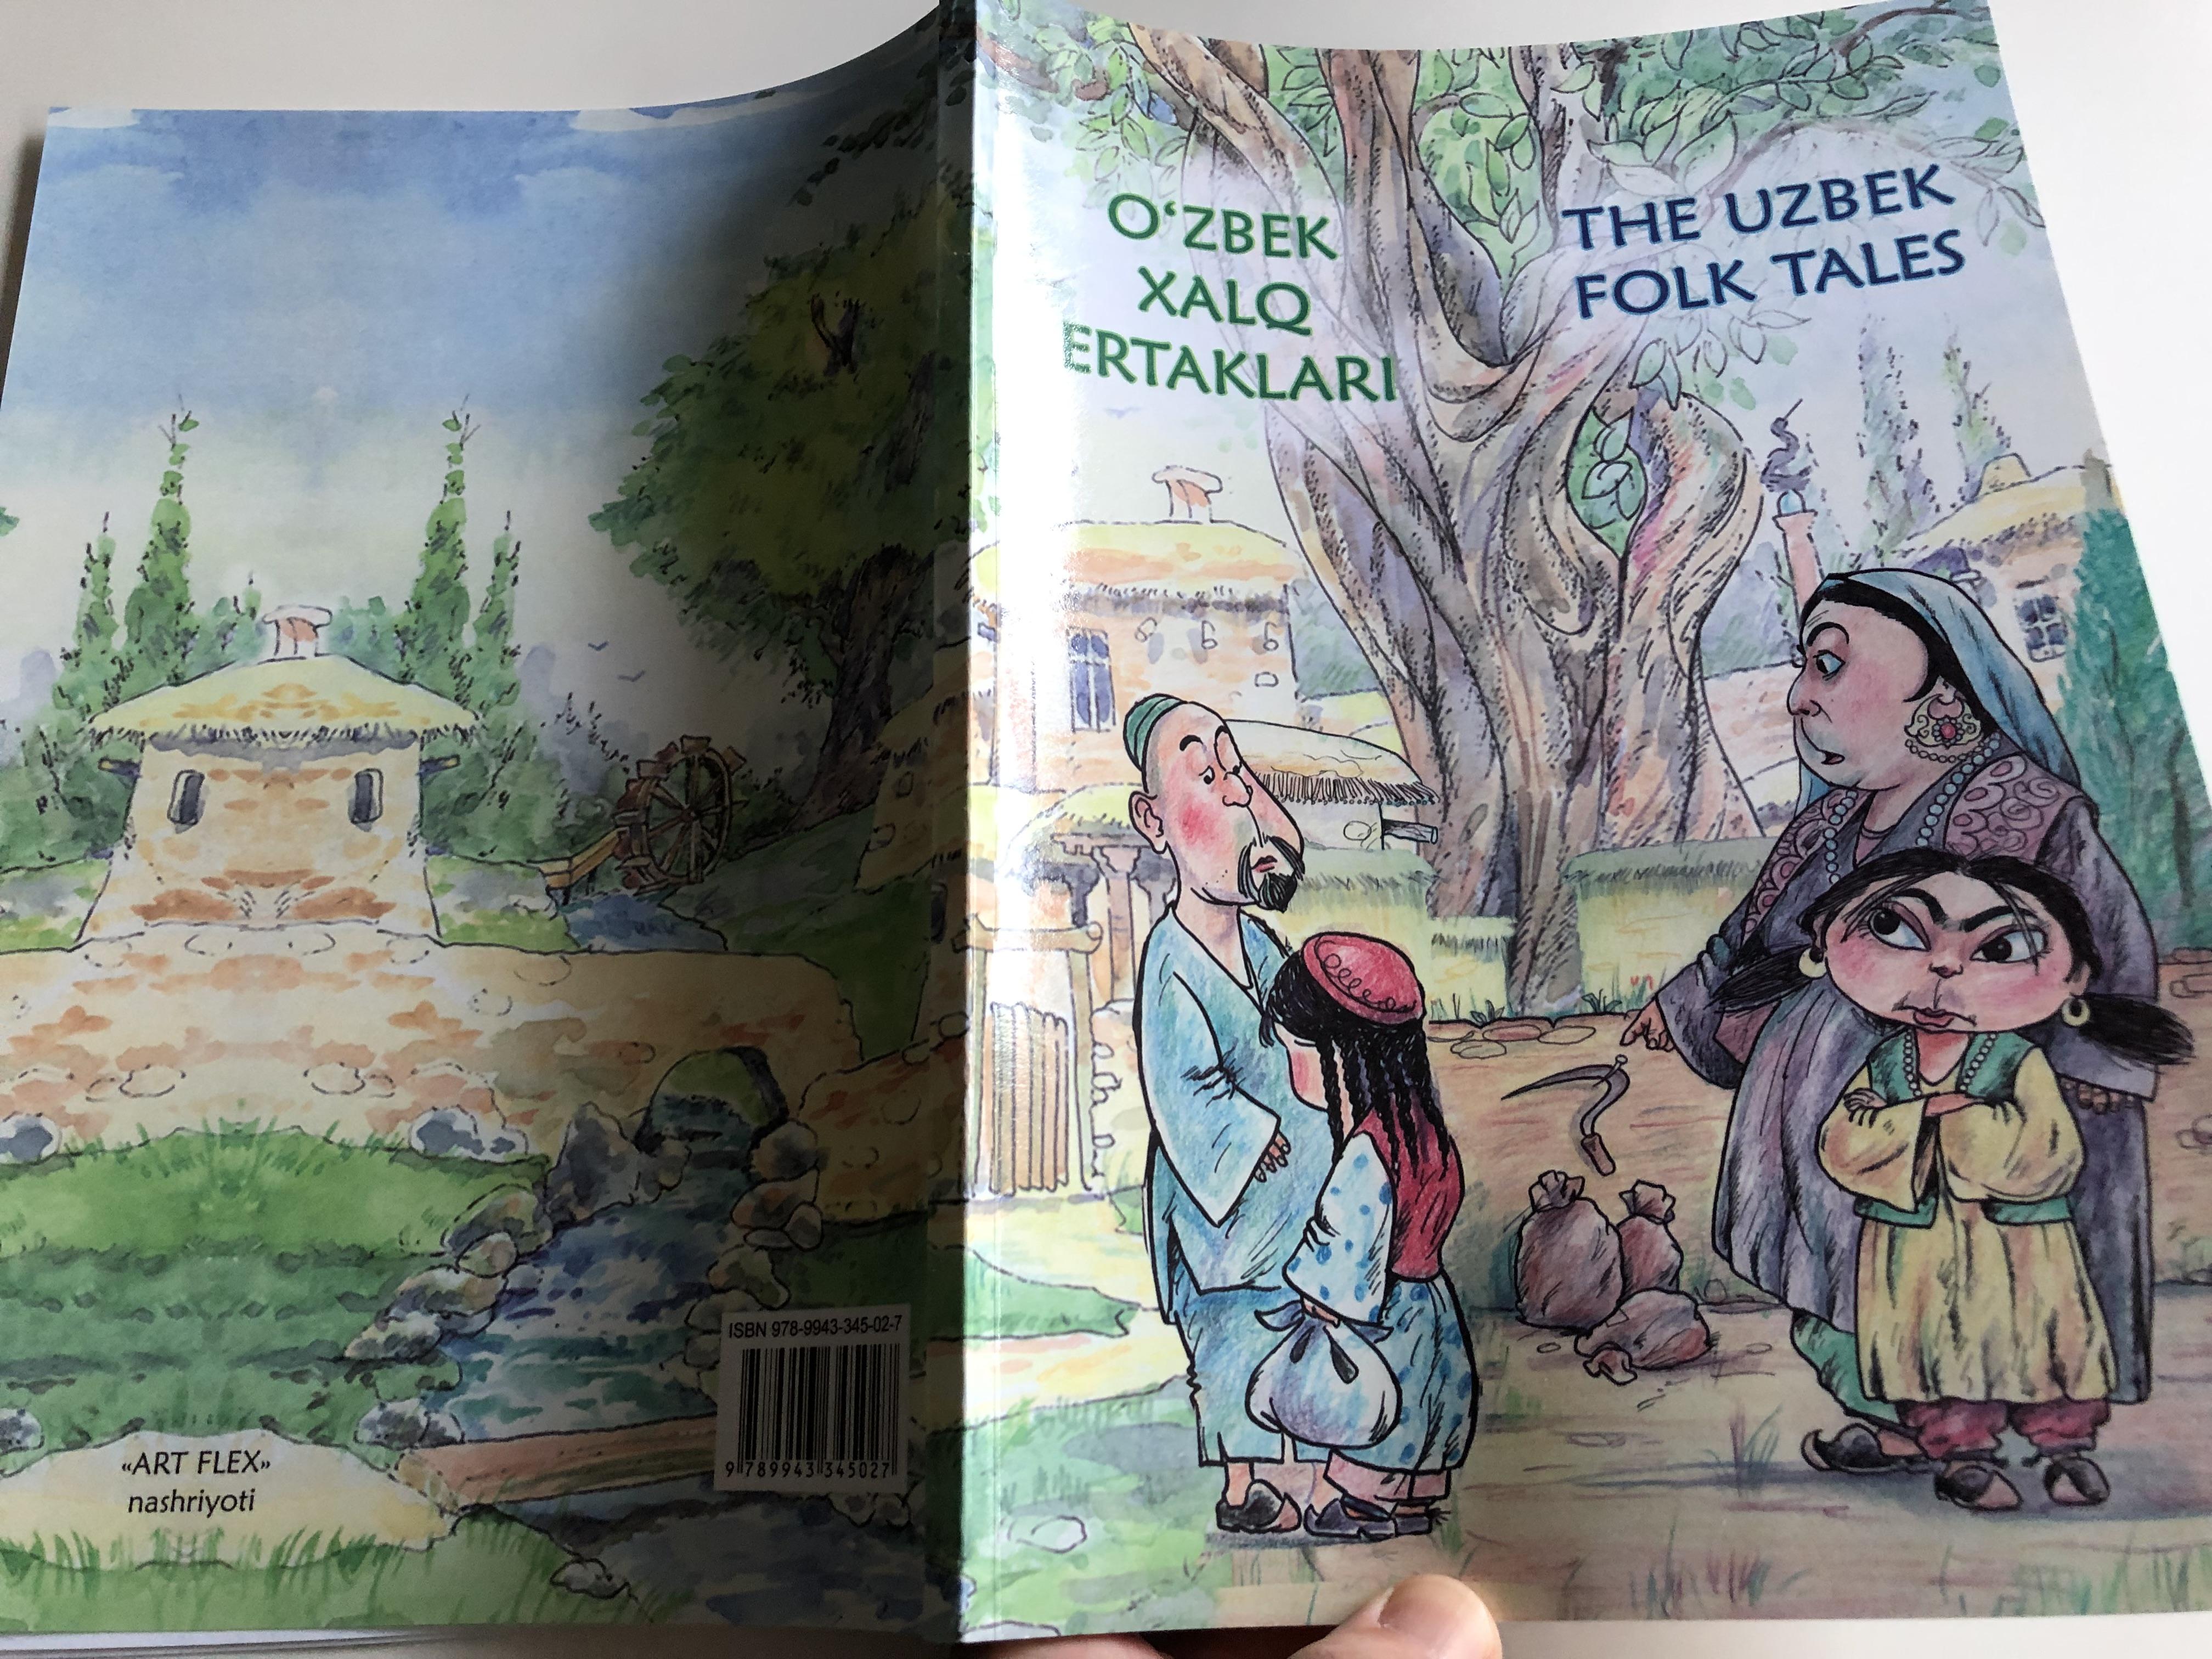 the-uzbek-folk-tales-o-zbek-xalq-ertaklari-by-husan-sodikov-uzbek-english-bilingual-edition-art-flex-paperback-2017-great-gift-for-children-13-.jpg